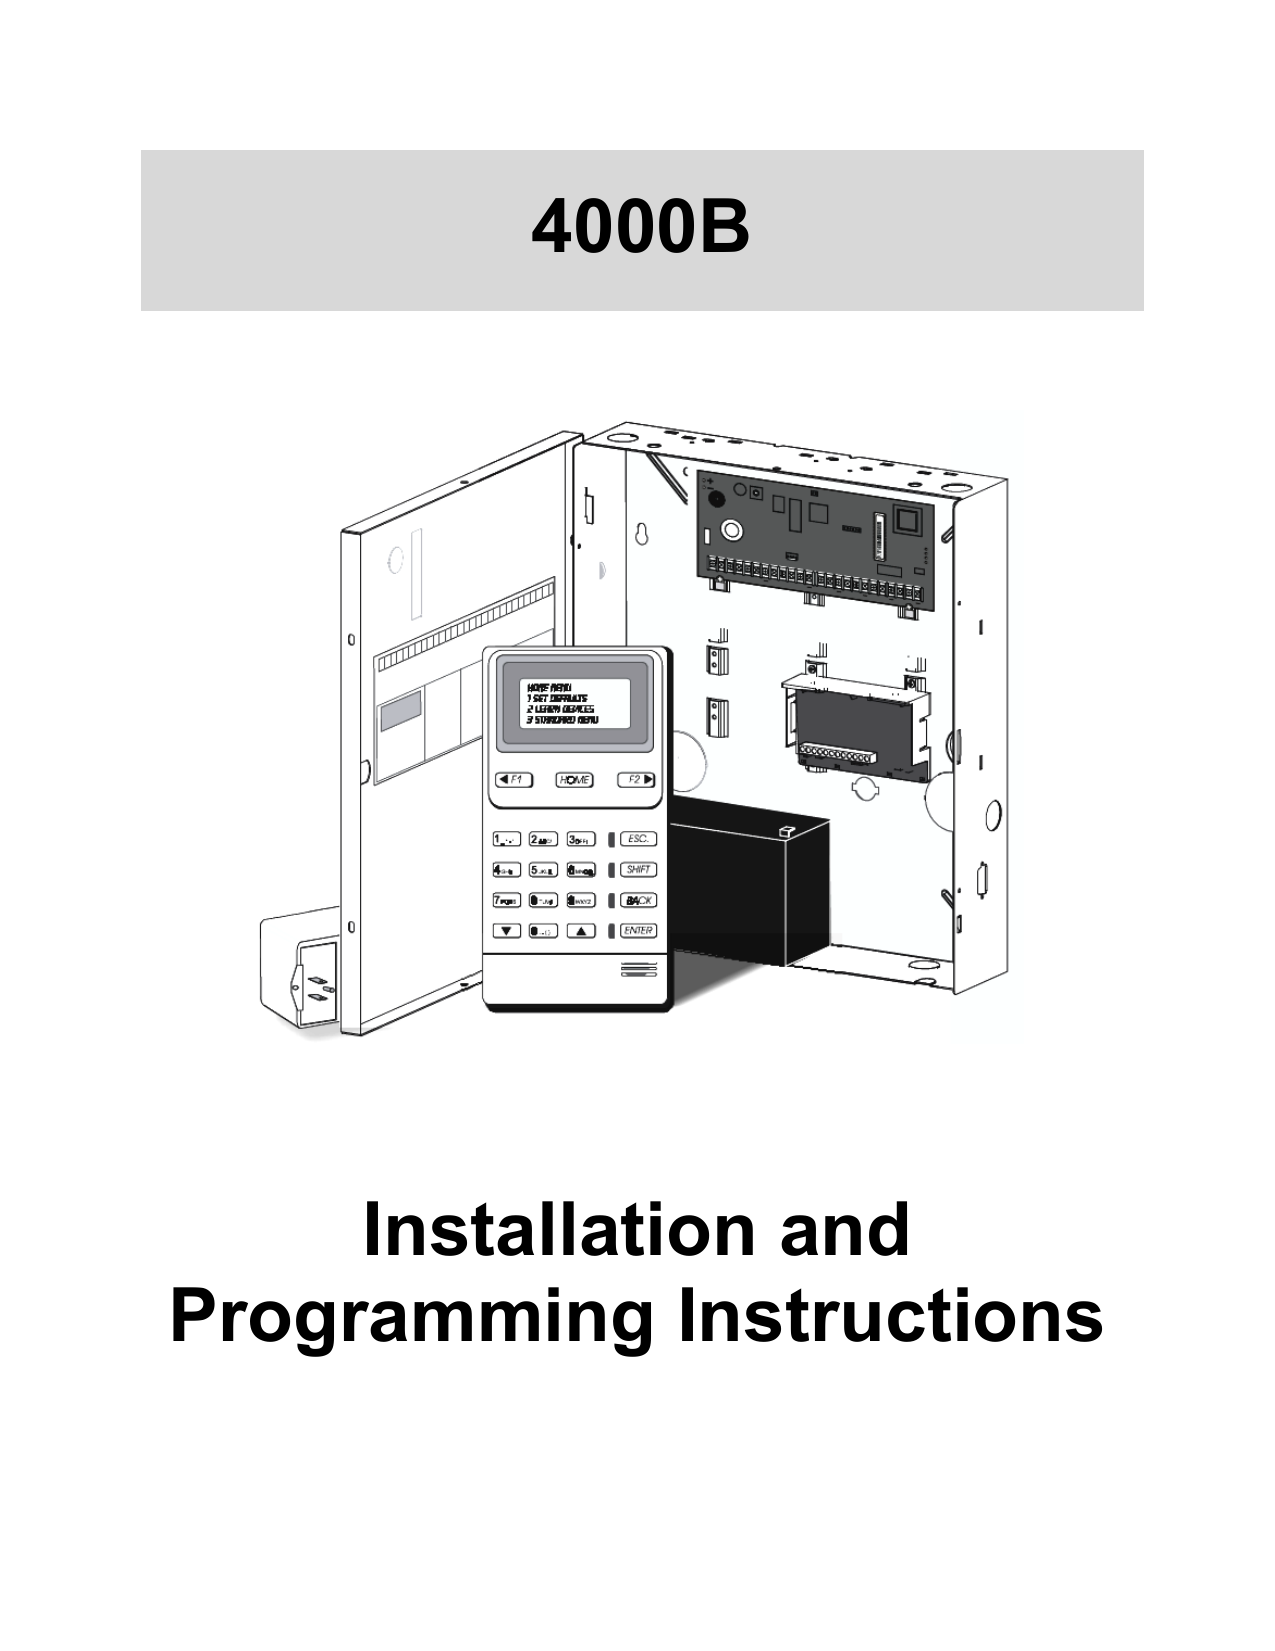 Brinks bhs 4000a installation manual